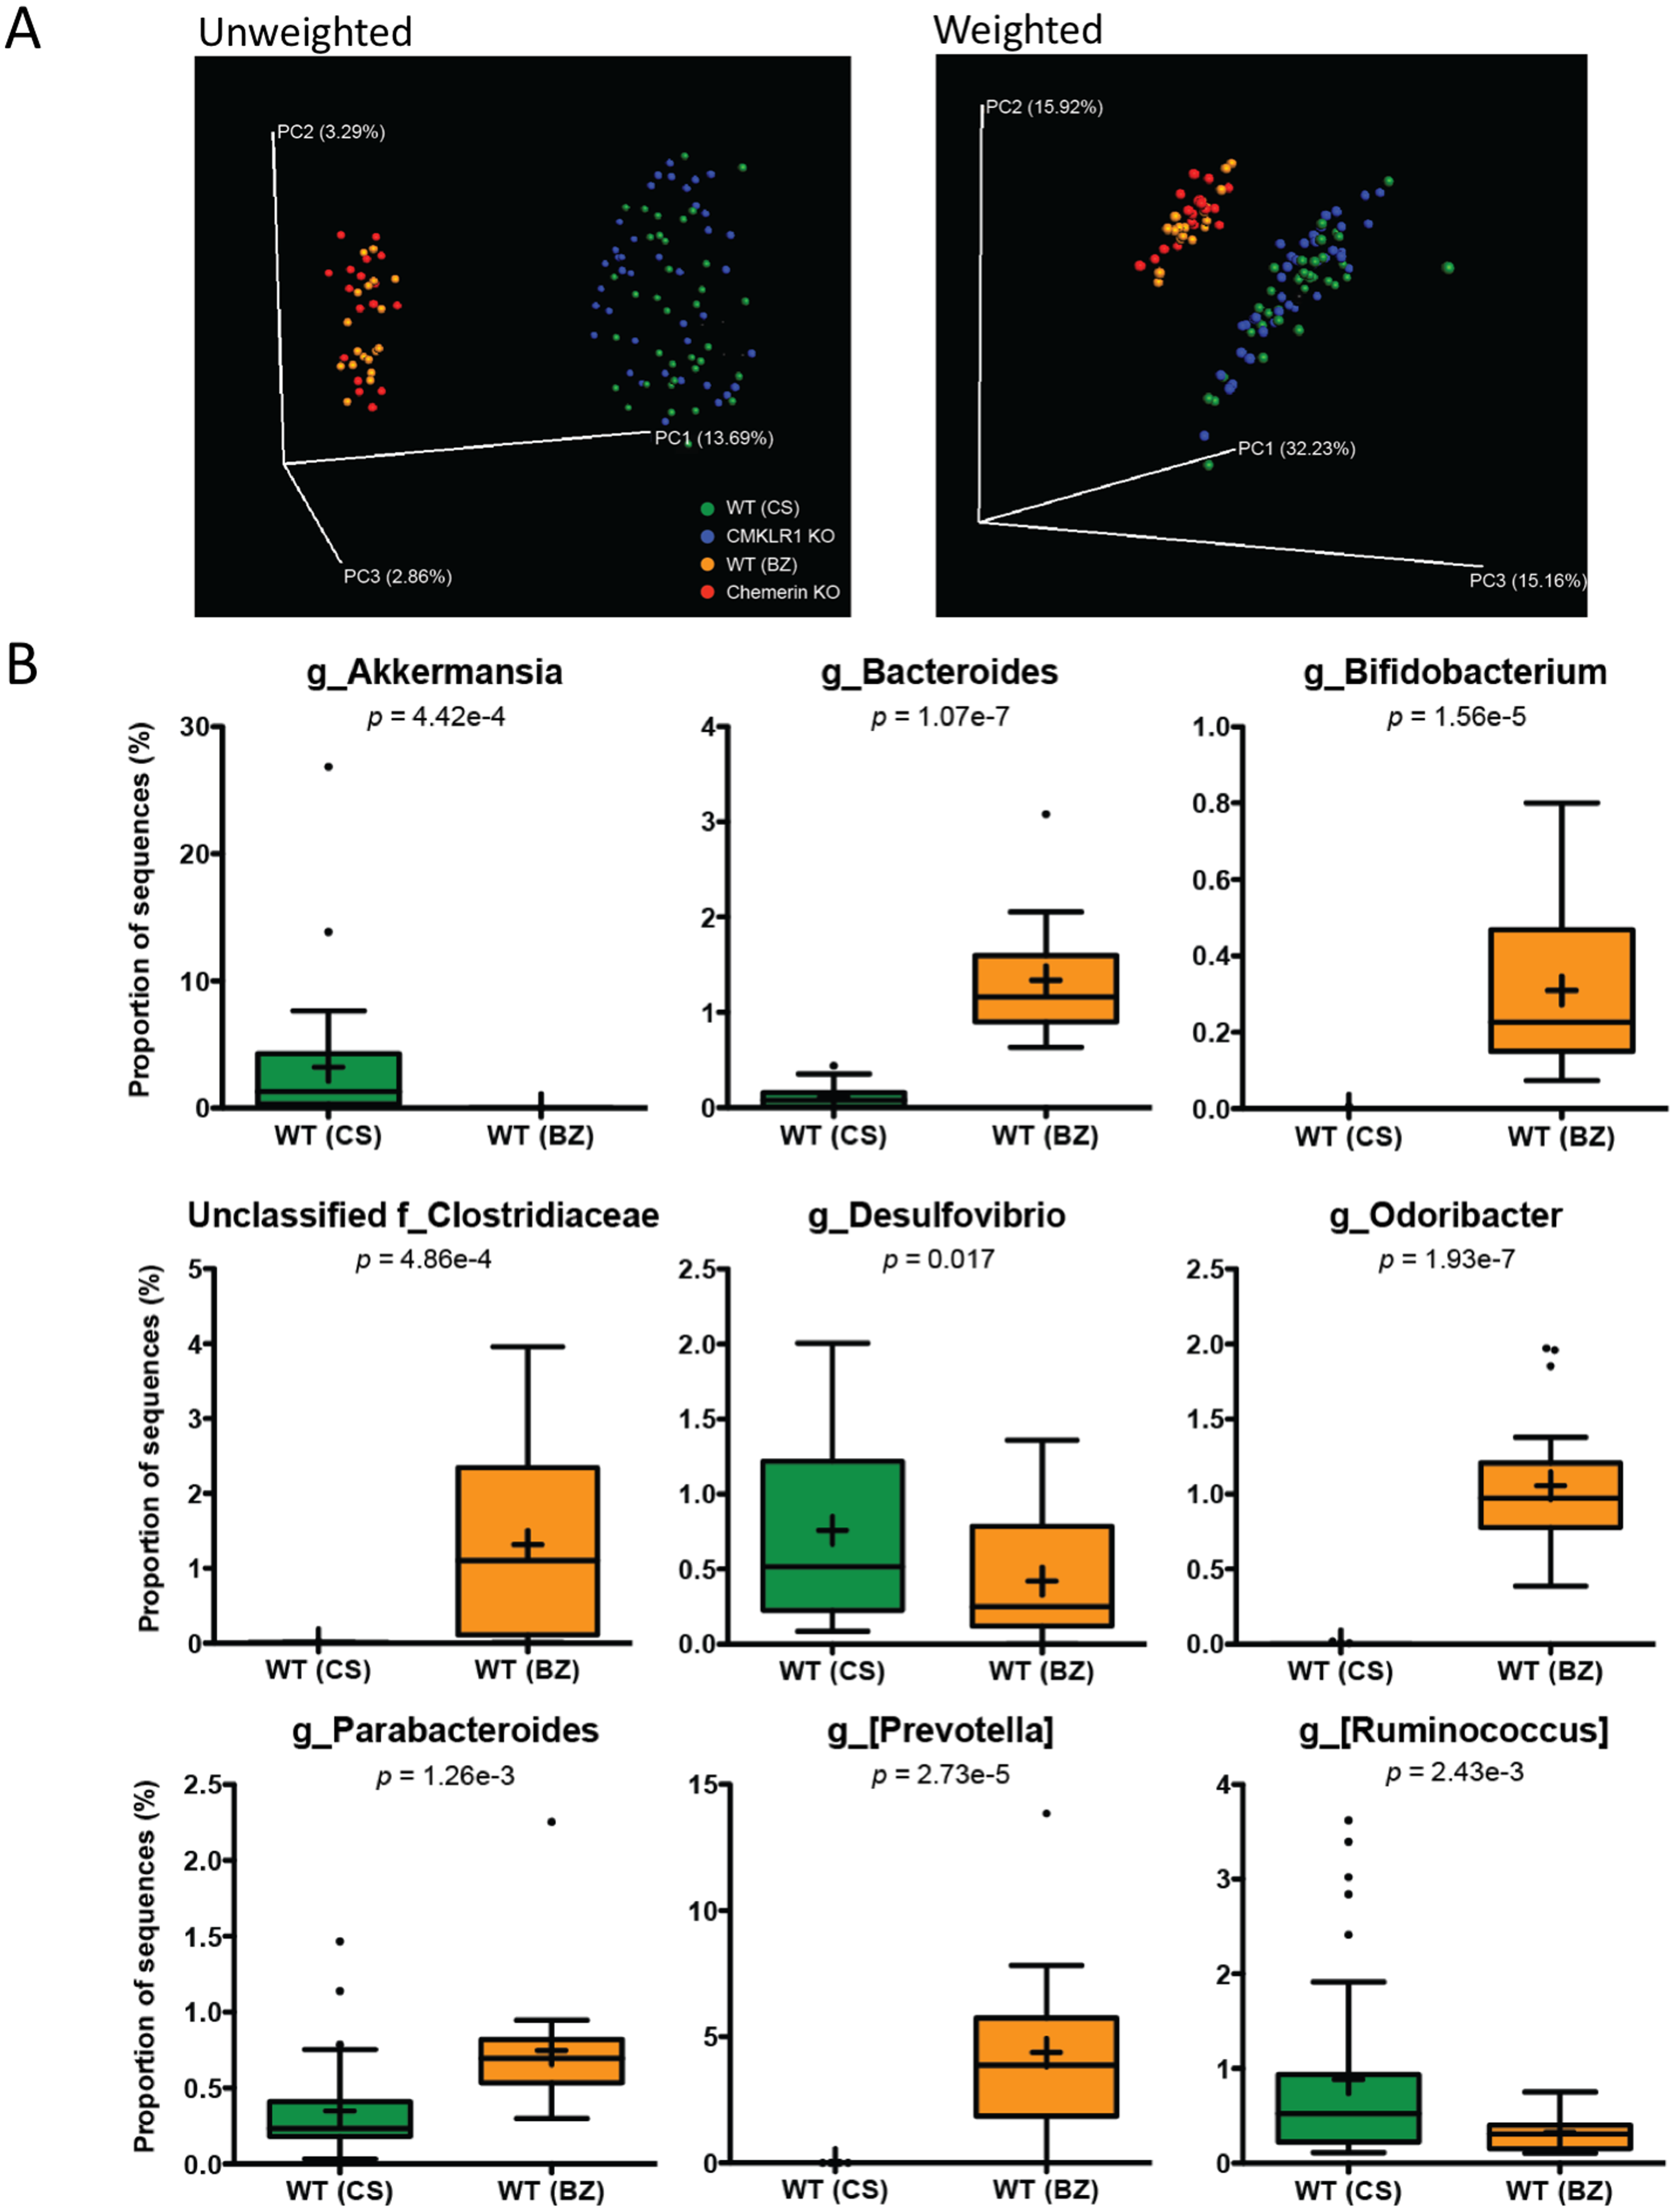 The impact of chemerin or chemokine-like receptor 1 loss on